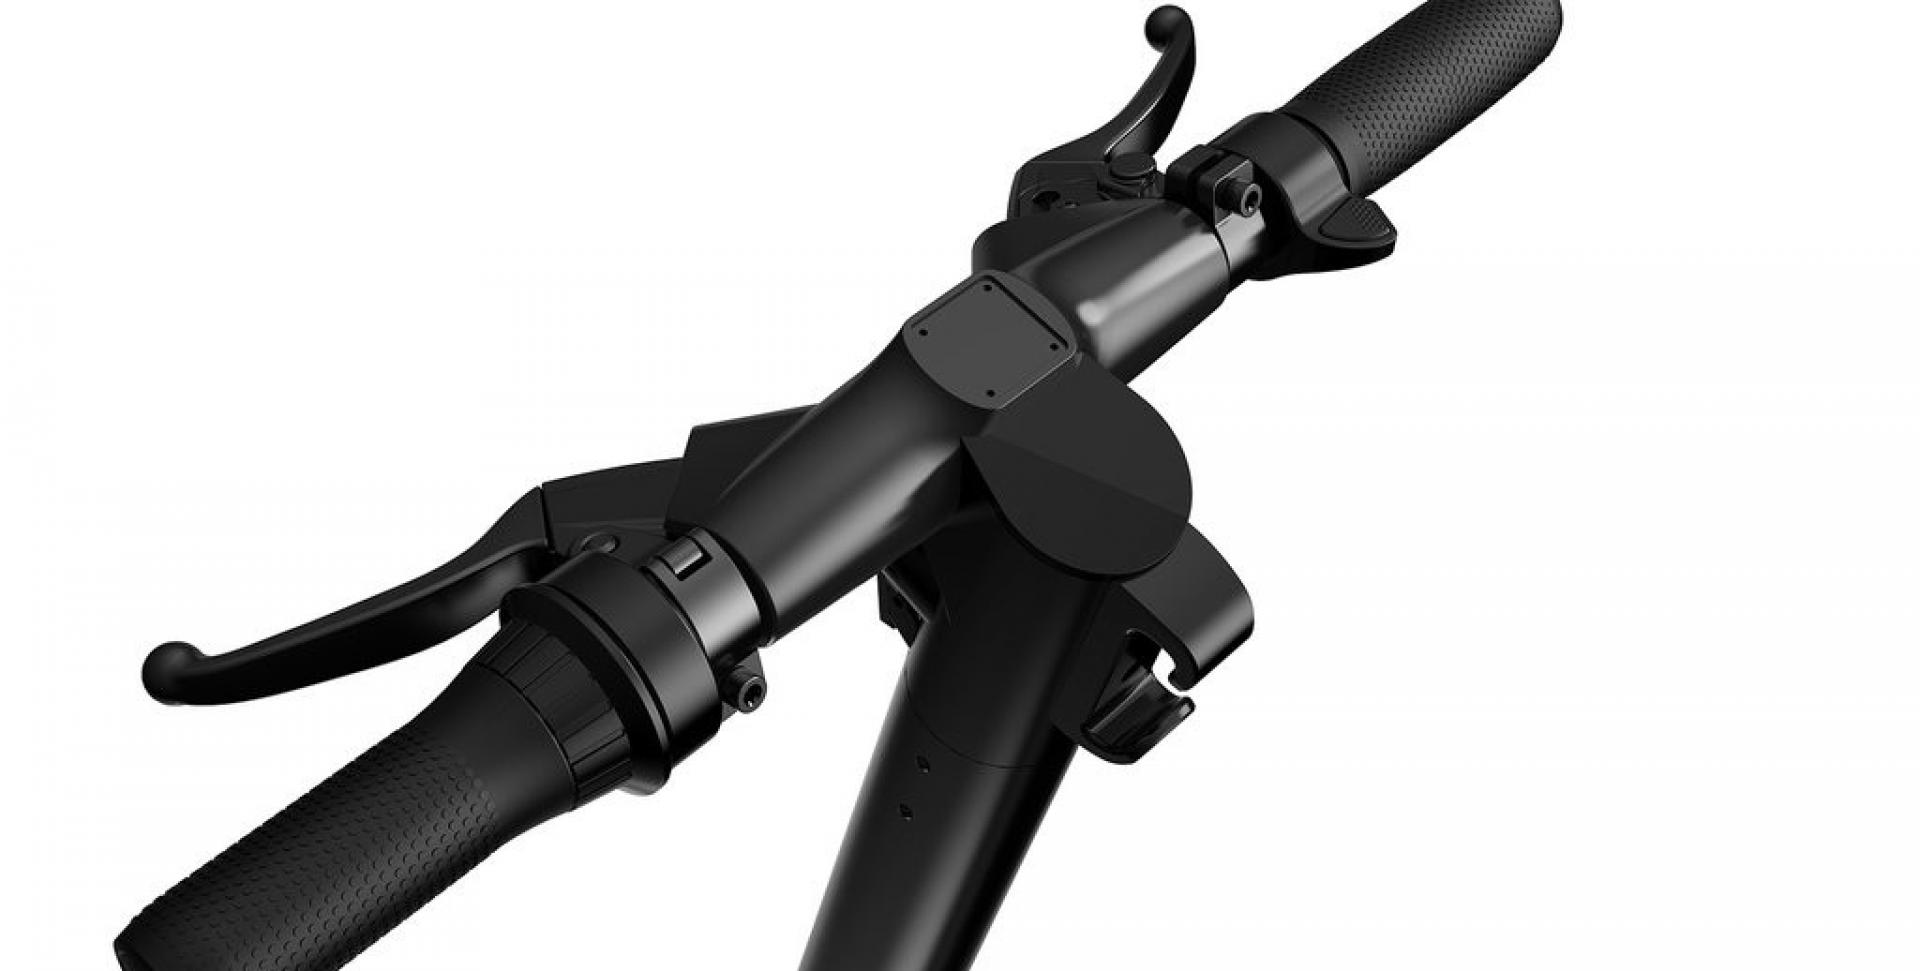 Okai-electric-scooter-es200-handlebar-topview_1024x1024.jpg